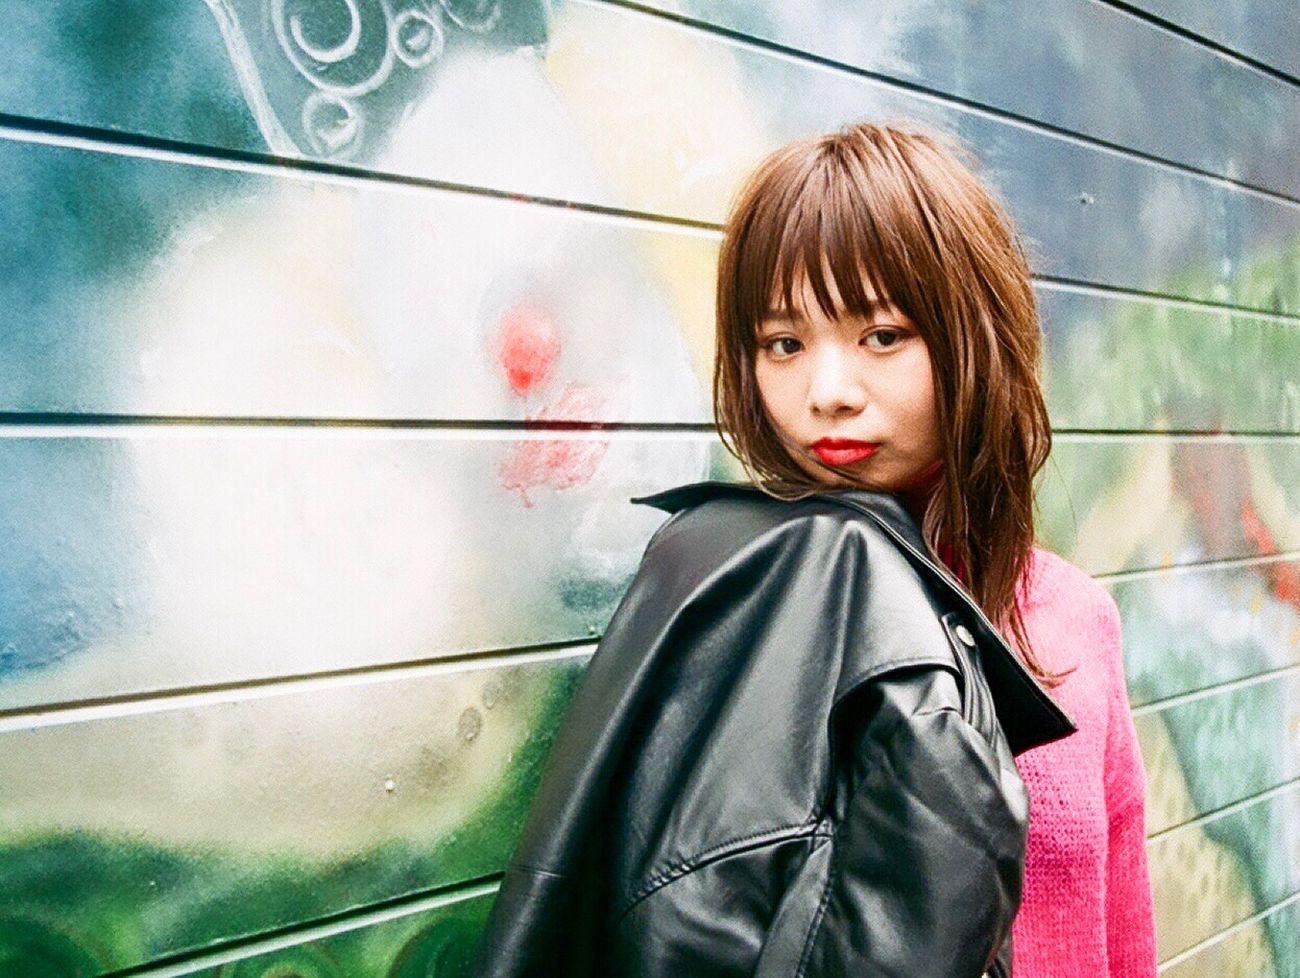 Tokyo Street Photography 下北沢 Film Photography Portrait Tokyo,Japan Filmcamera Snap Hairmake Makeup Fashion 3ce